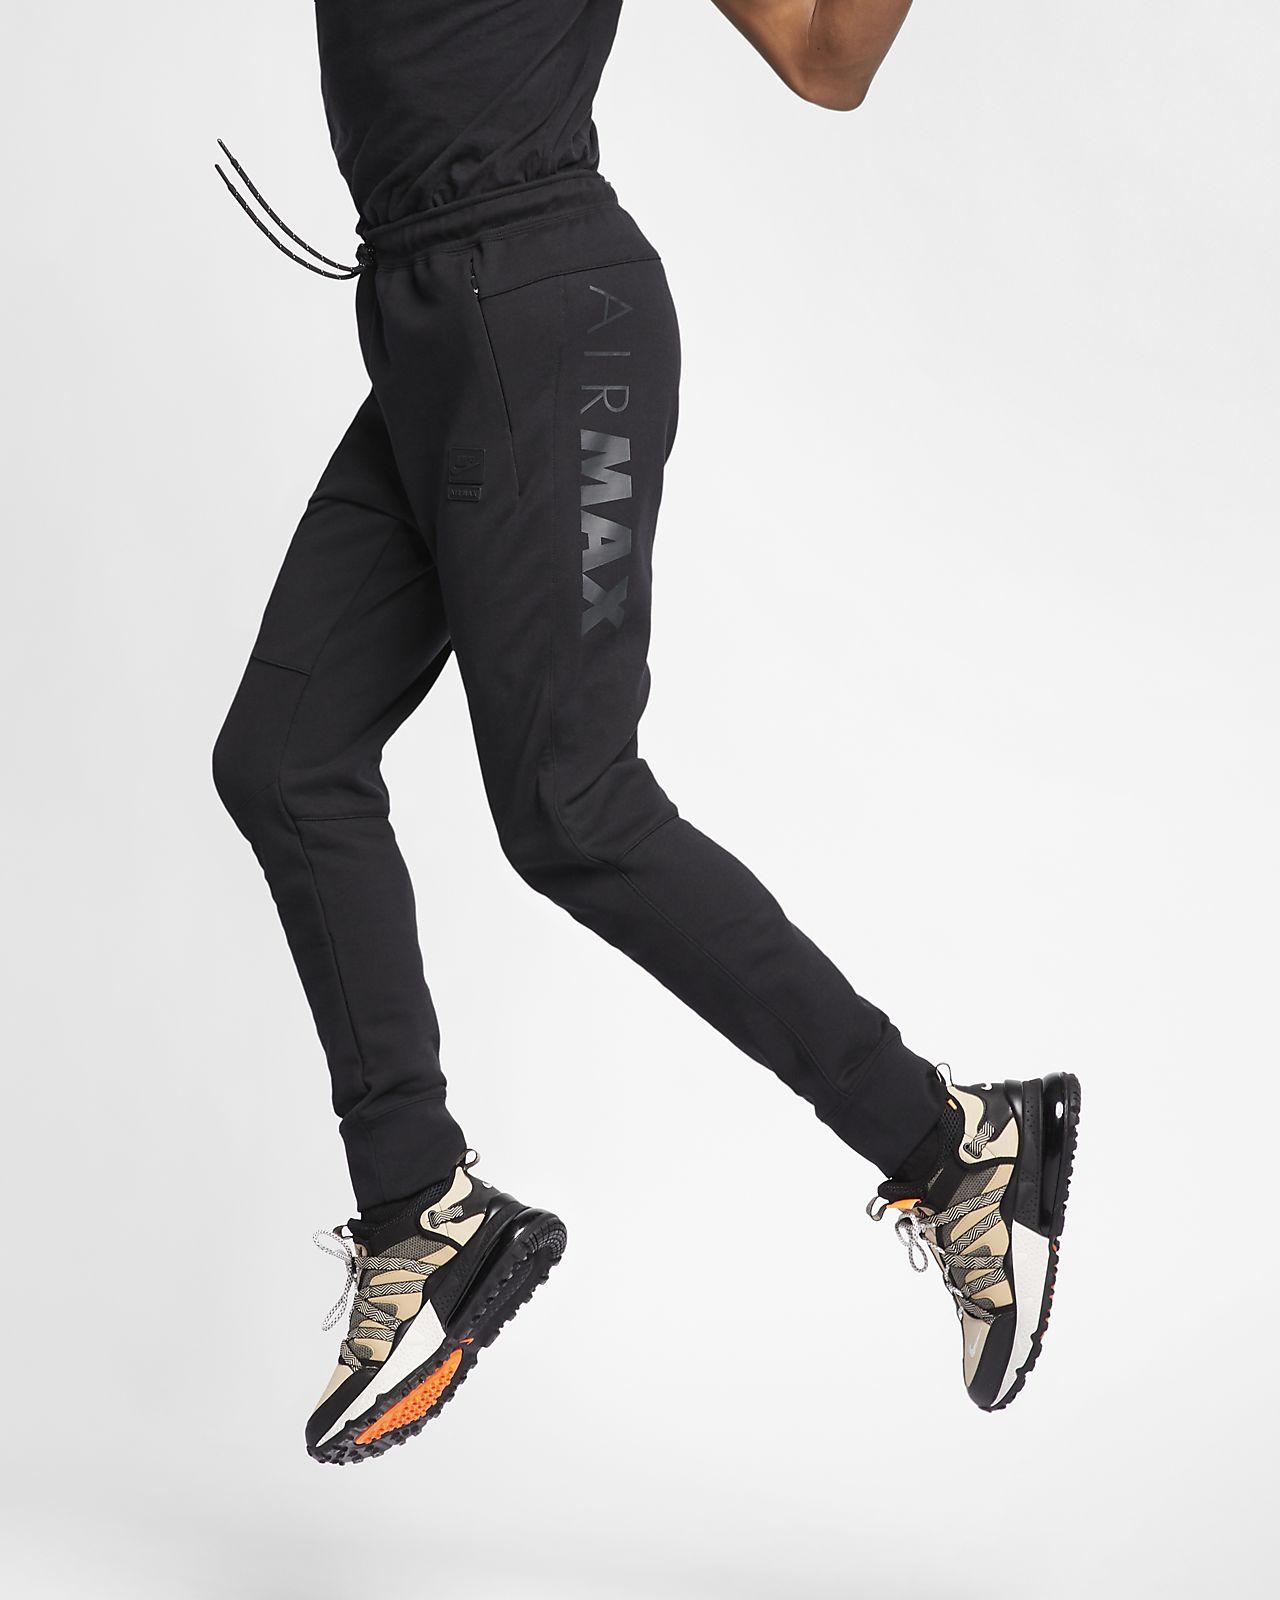 official photos 9b0df 90cfd ... Byxor i frotté Nike Sportswear för män